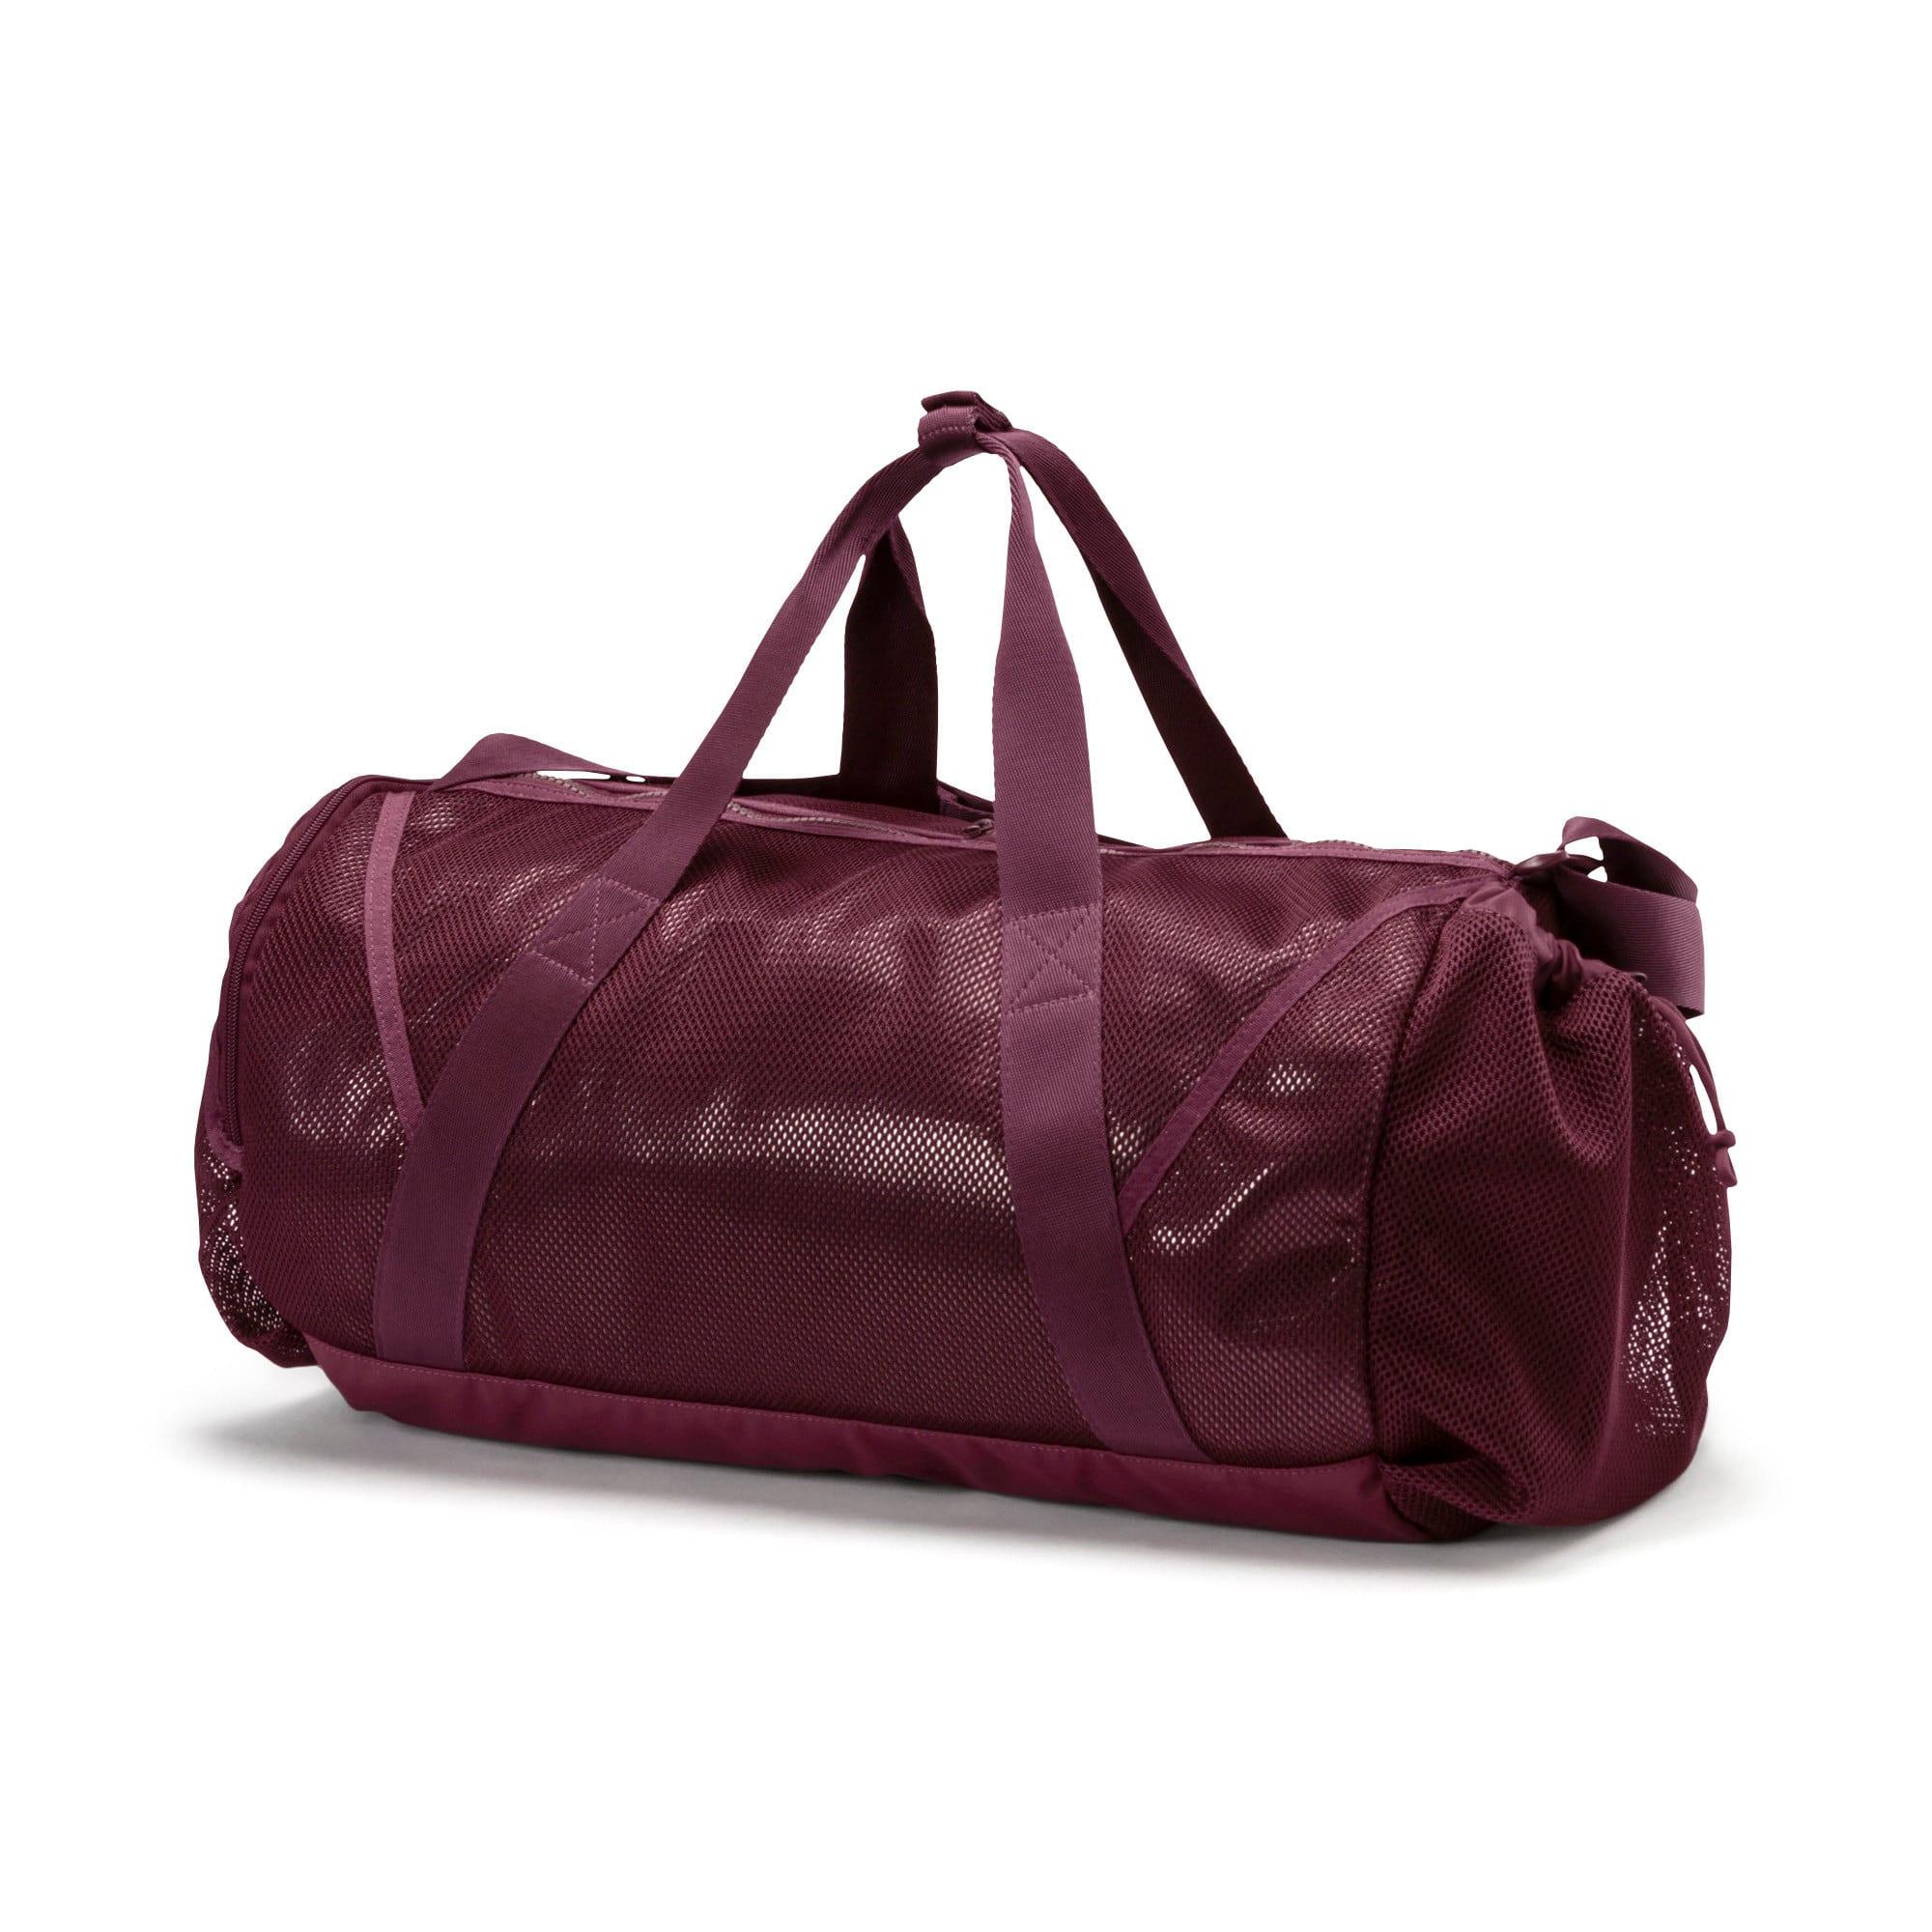 Thumbnail 2 of Ambition Women's Barrel Bag, Fig-Bronze-metallic, medium